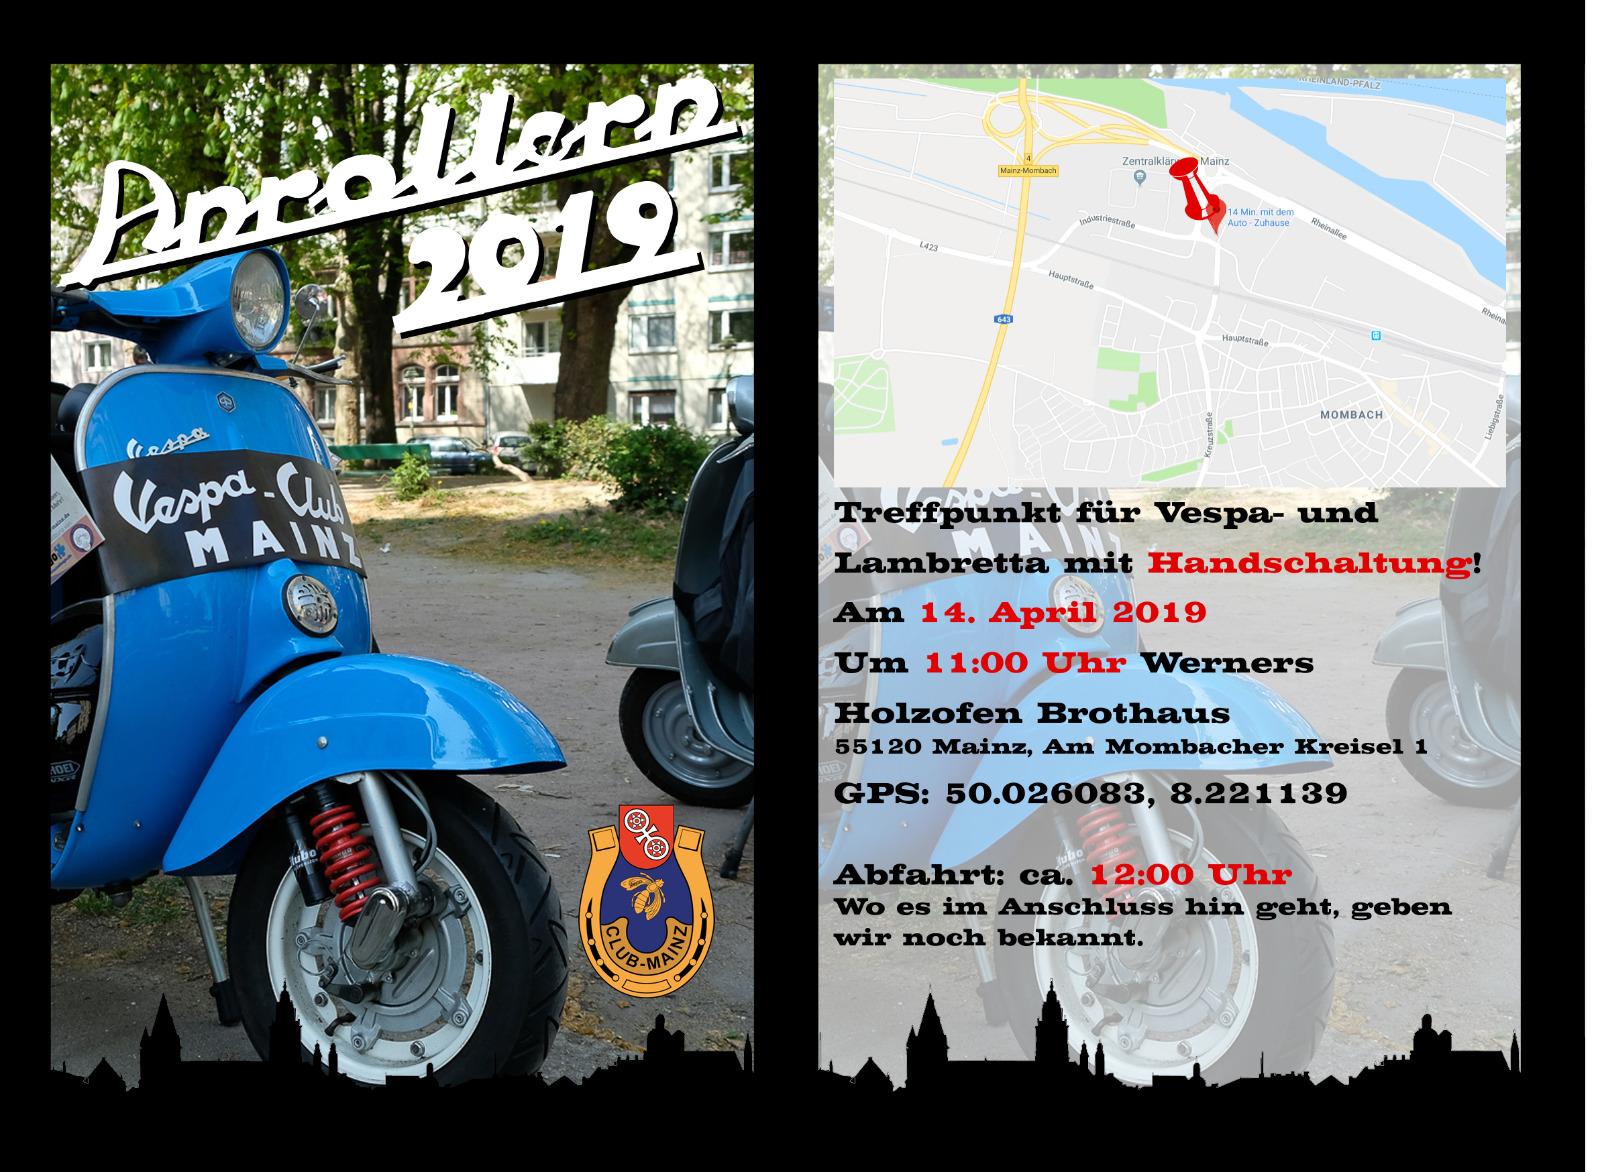 VERSCHOBEN!!! Anrollern 2019 des Vespa-Club Mainz